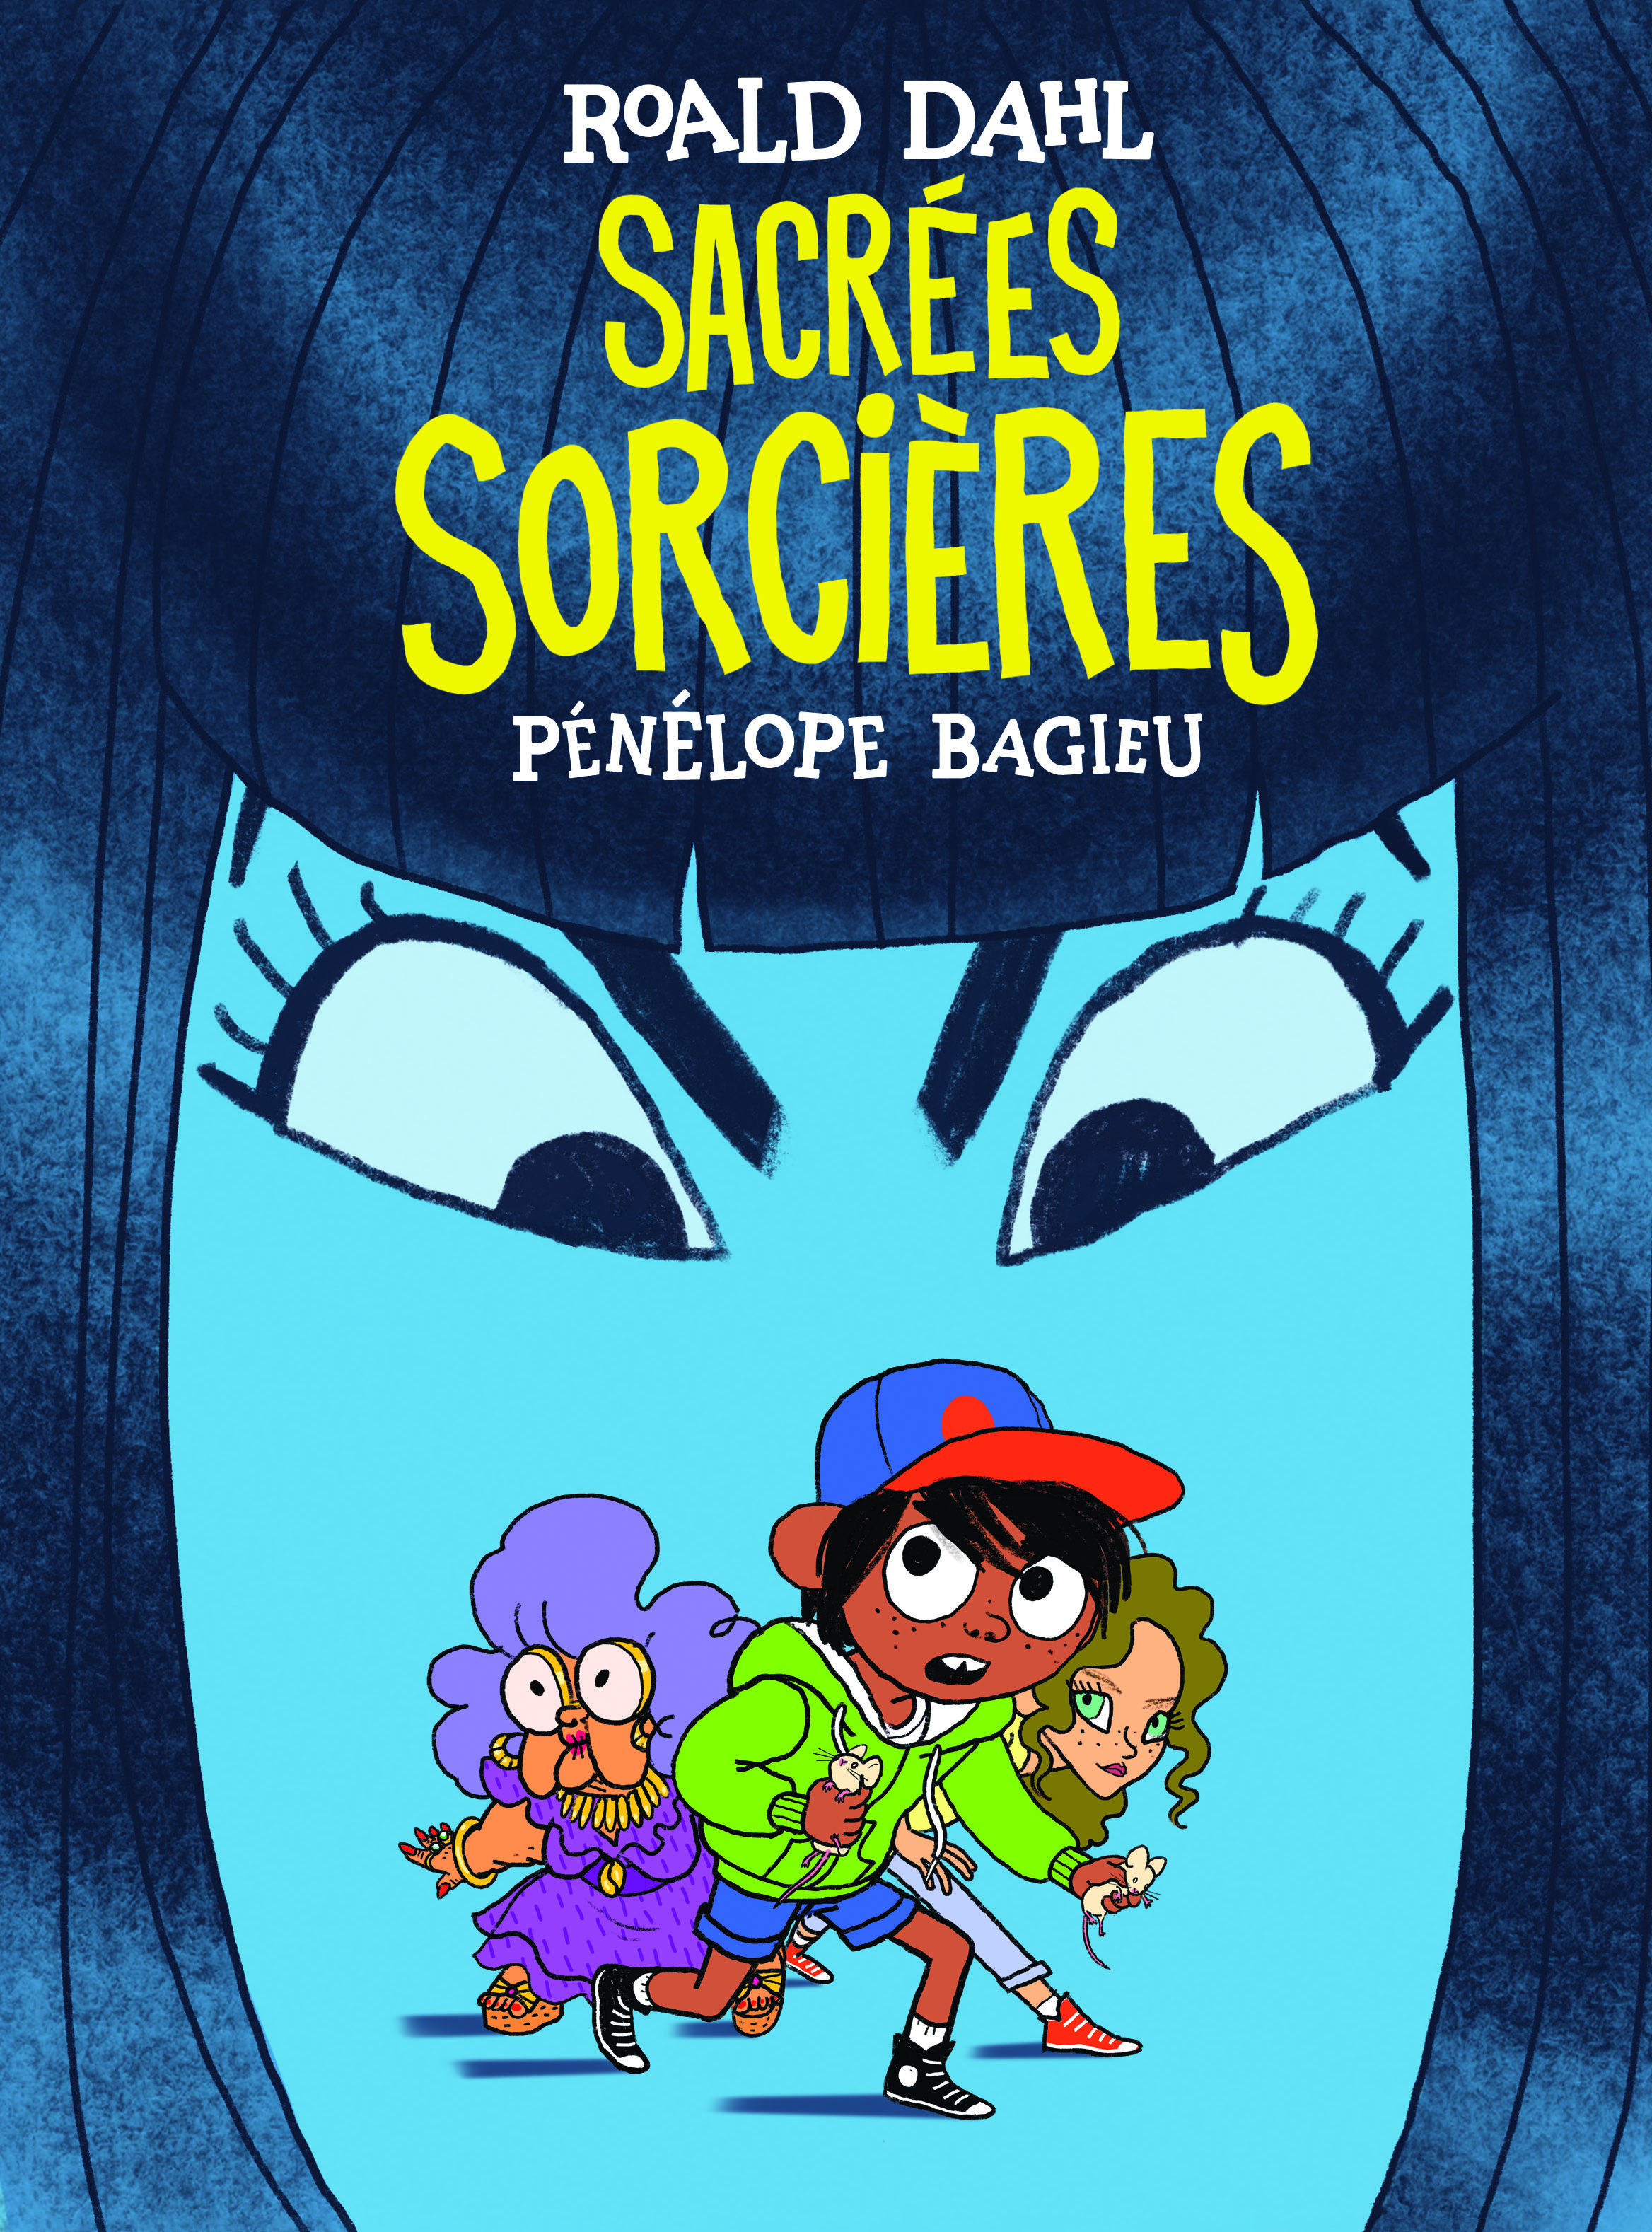 J01969_sacrees sorcieres_Couv.indd